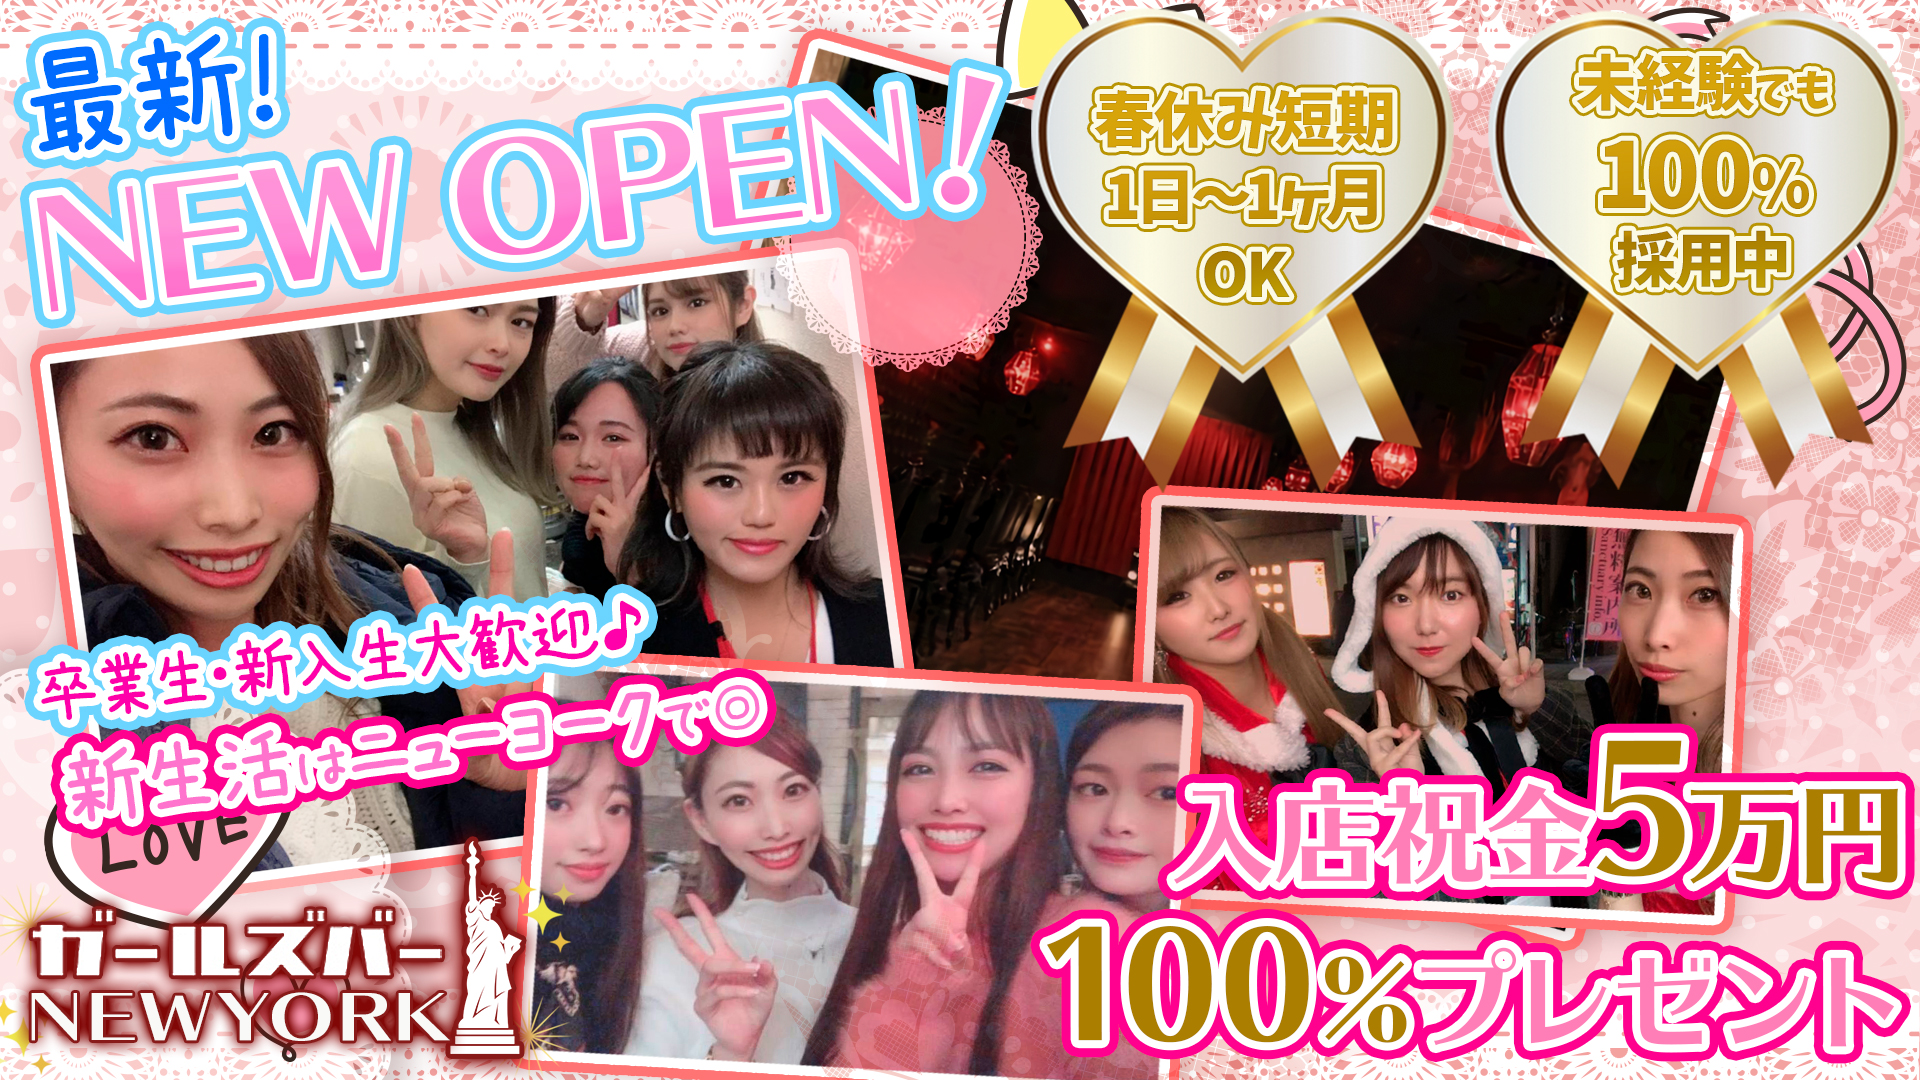 GIRLS BAR NEWYORK~ガールズバーニューヨーク~ 千葉 ガールズバー TOP画像